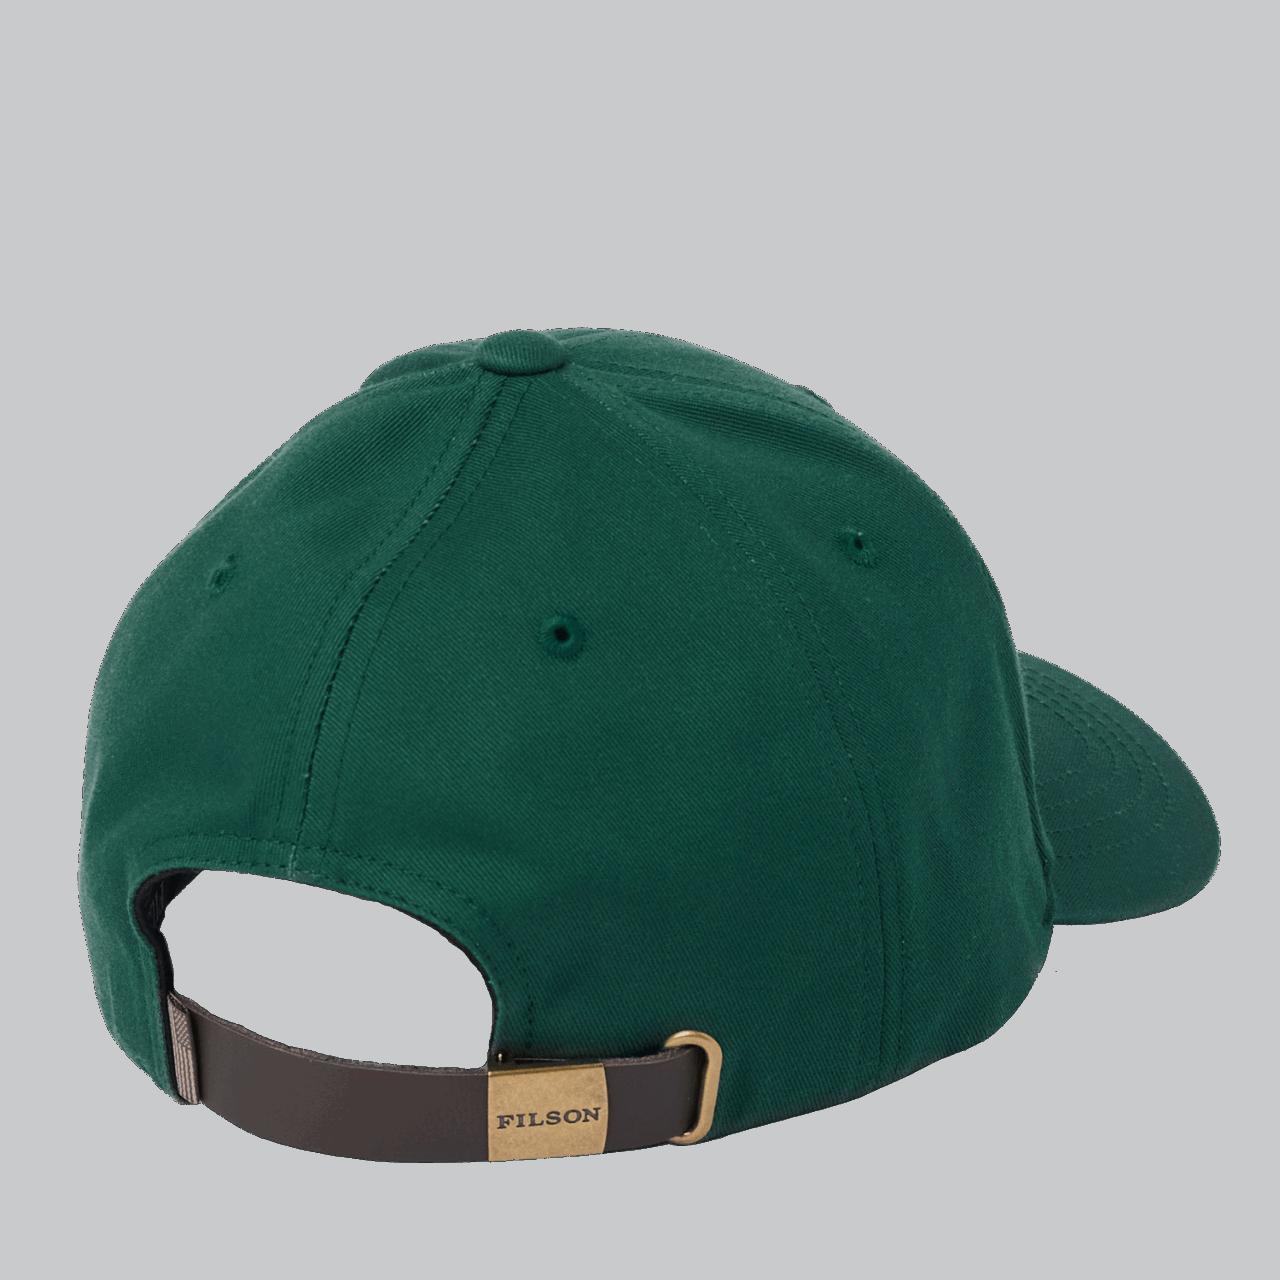 Filson Logger Cap - darkgreen